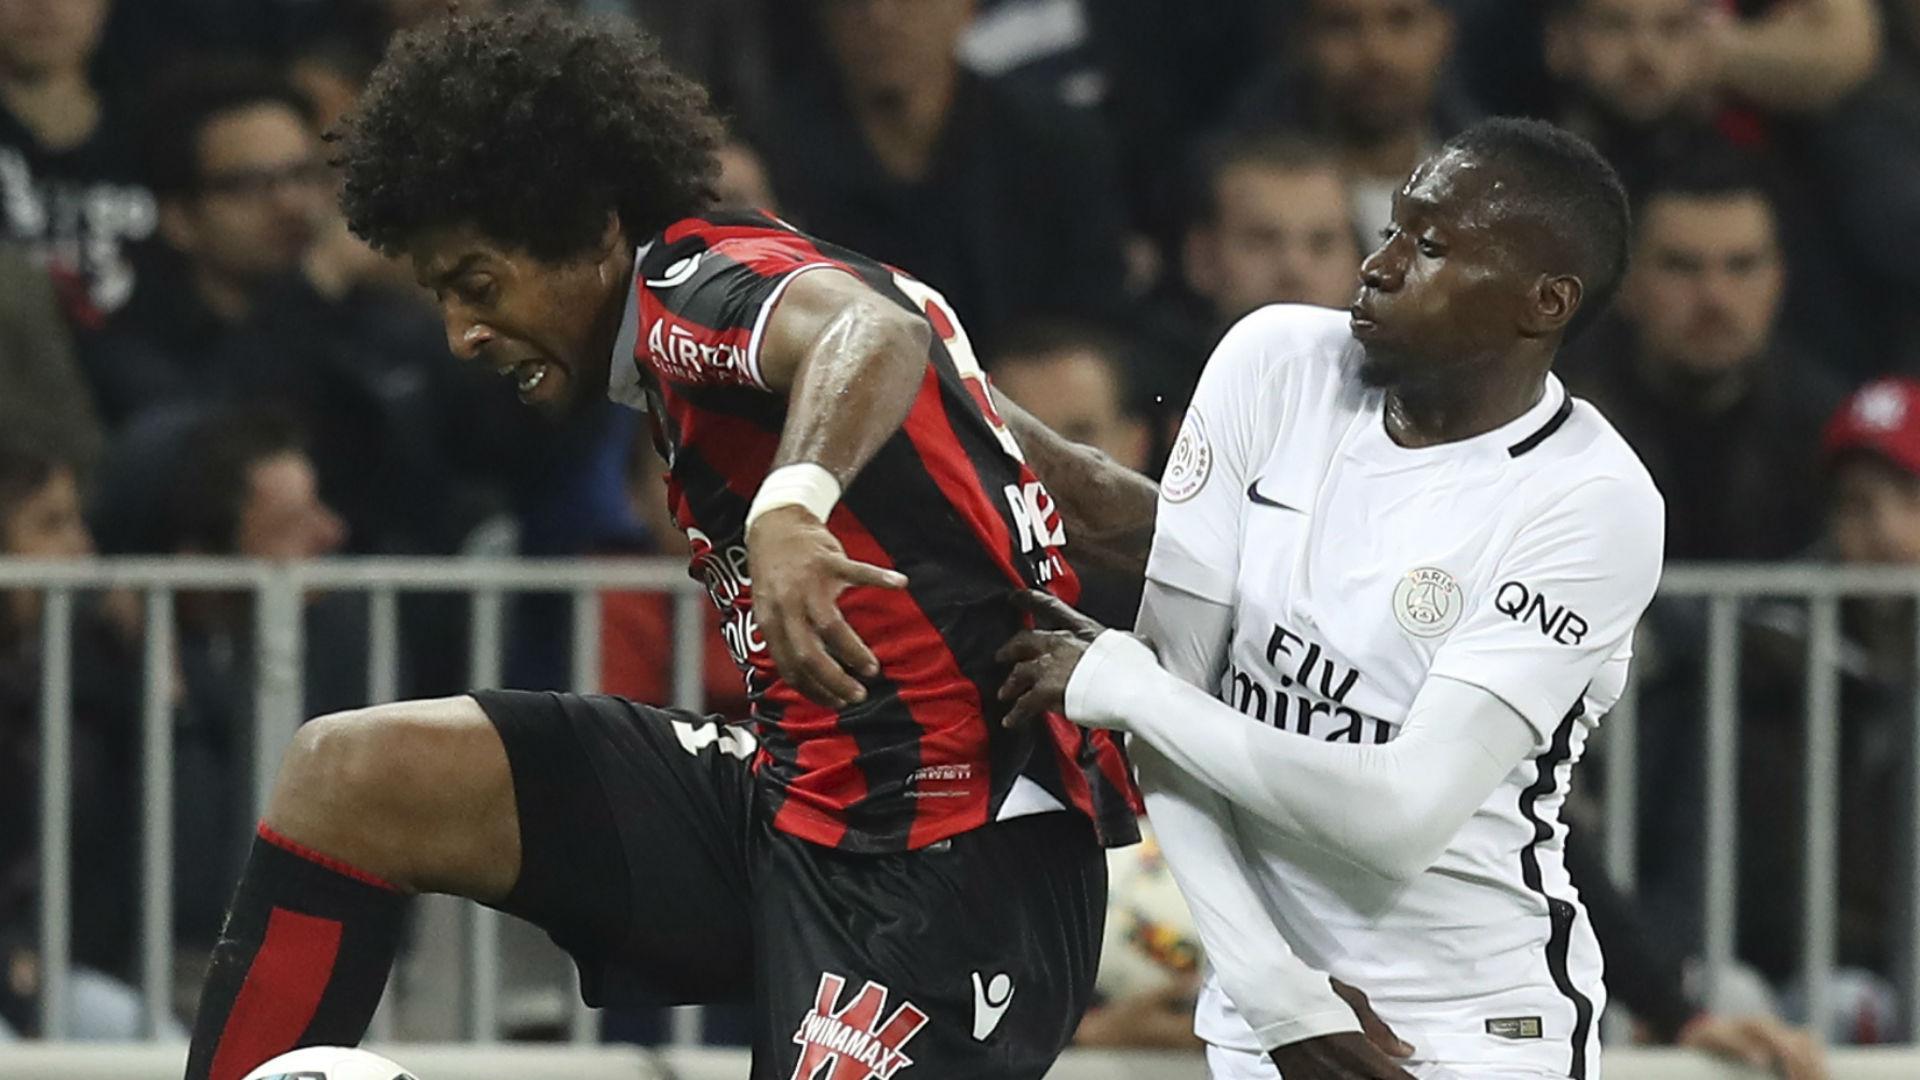 Fechado! Matuidi é confirmado como novo jogador da Juventus